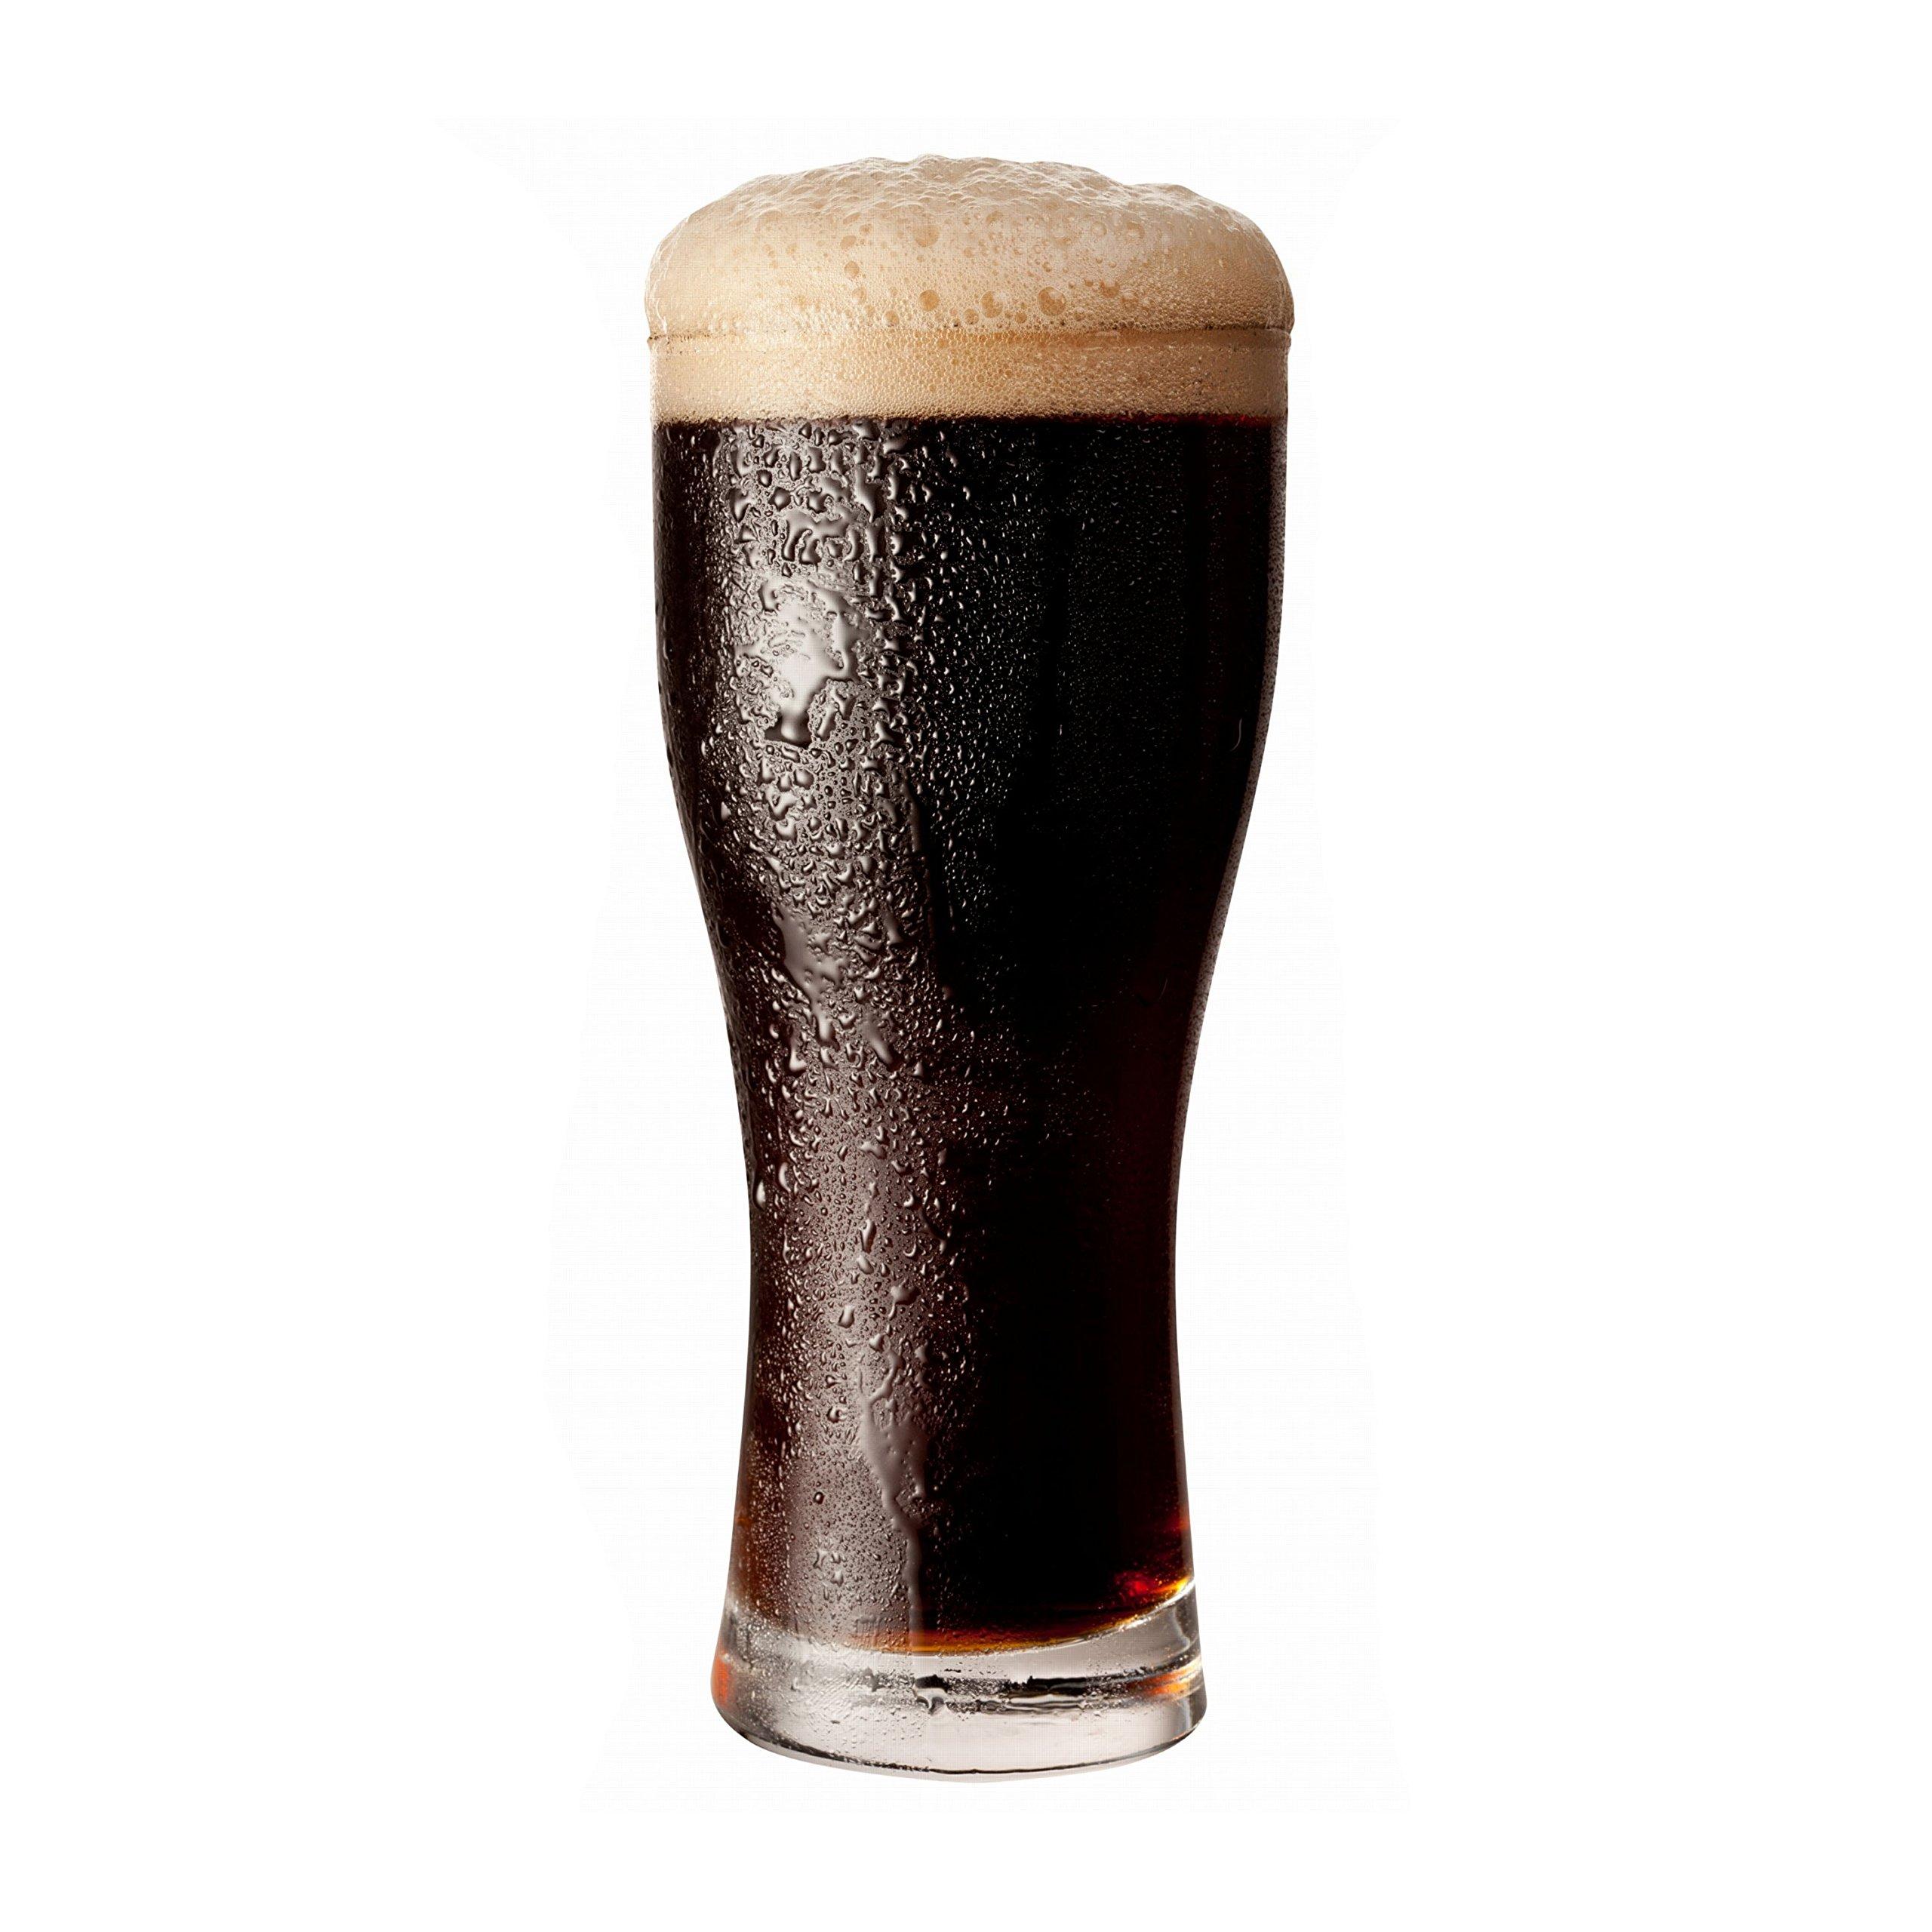 Home Brew Stuff HBS-BALTICPORTER Baltic Porter ALE Beer Recipe Ingredient Kit